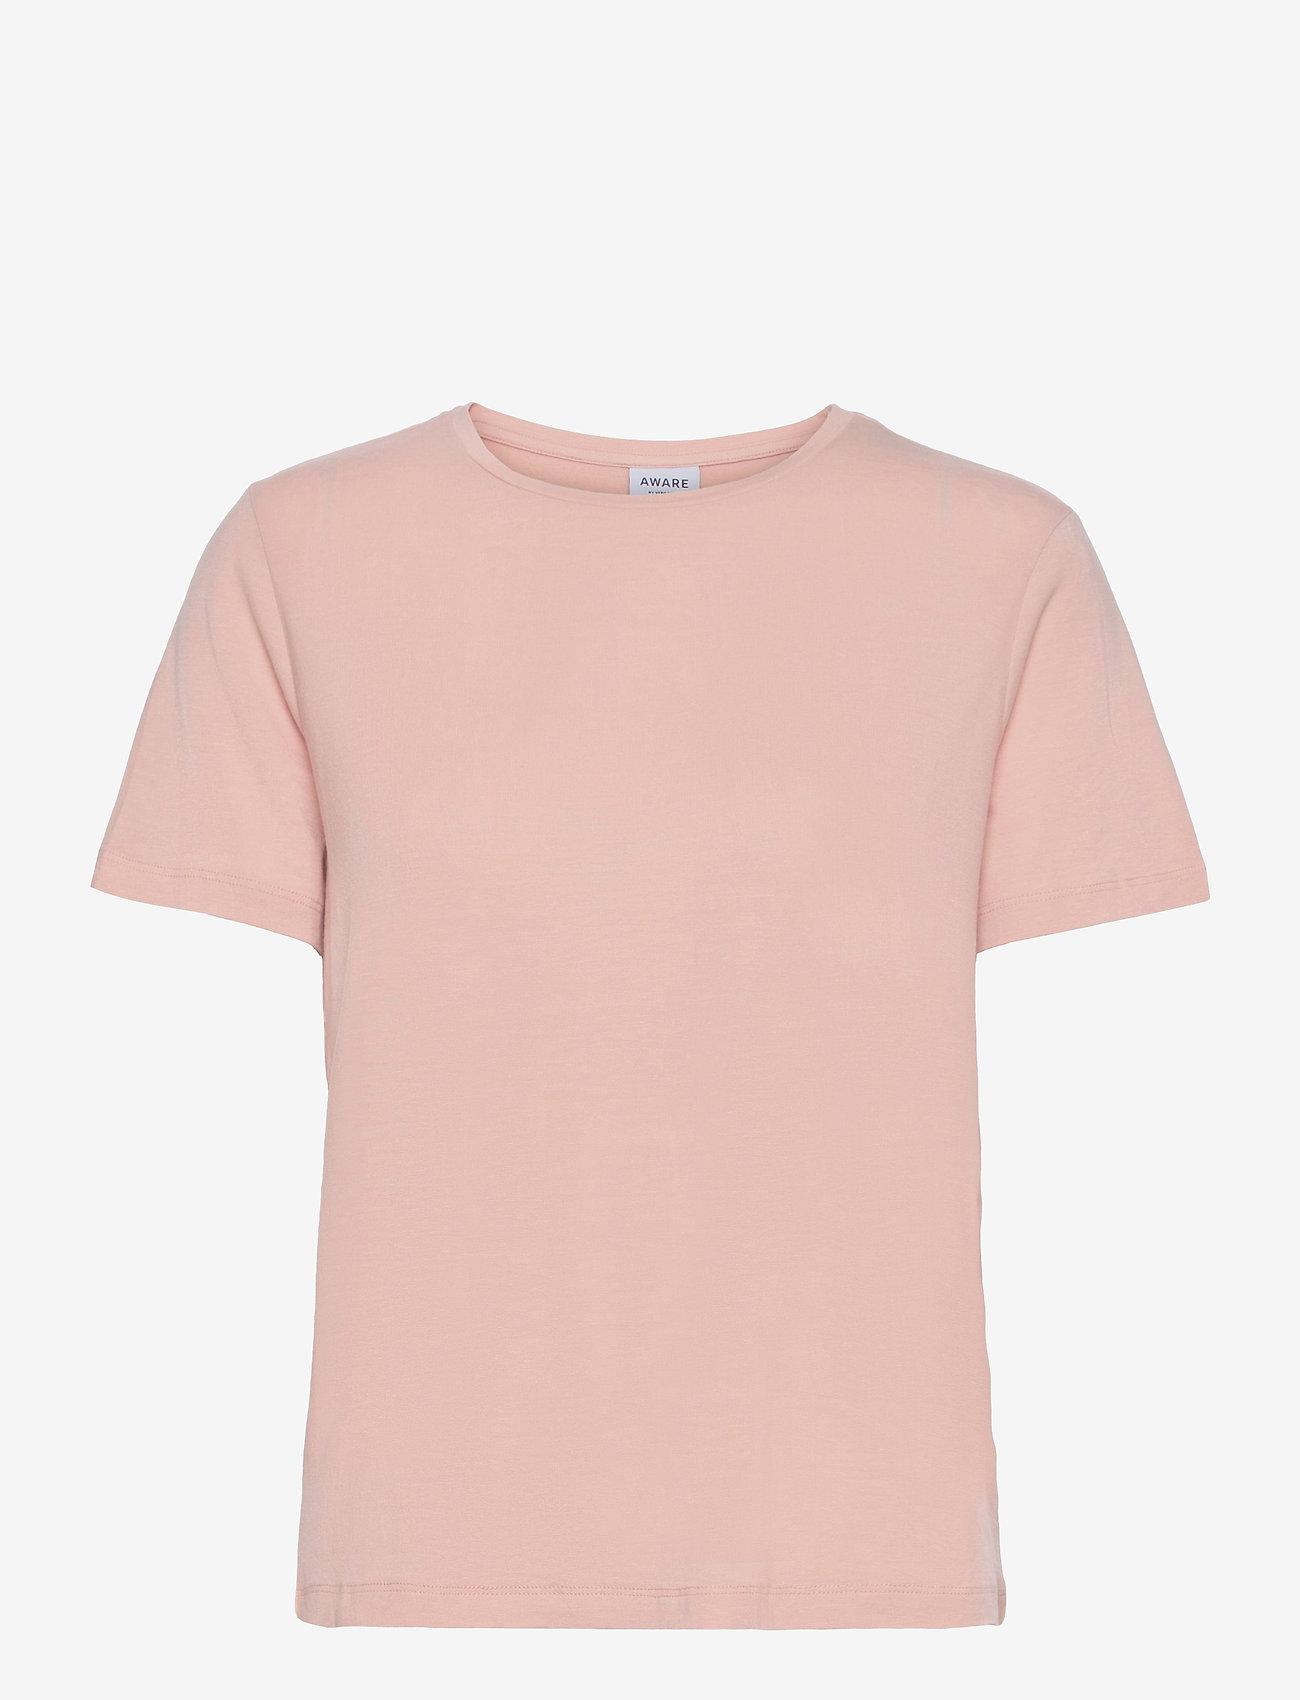 Vero Moda - VMAVA SS TOP VMA - t-shirts - rose dust - 0